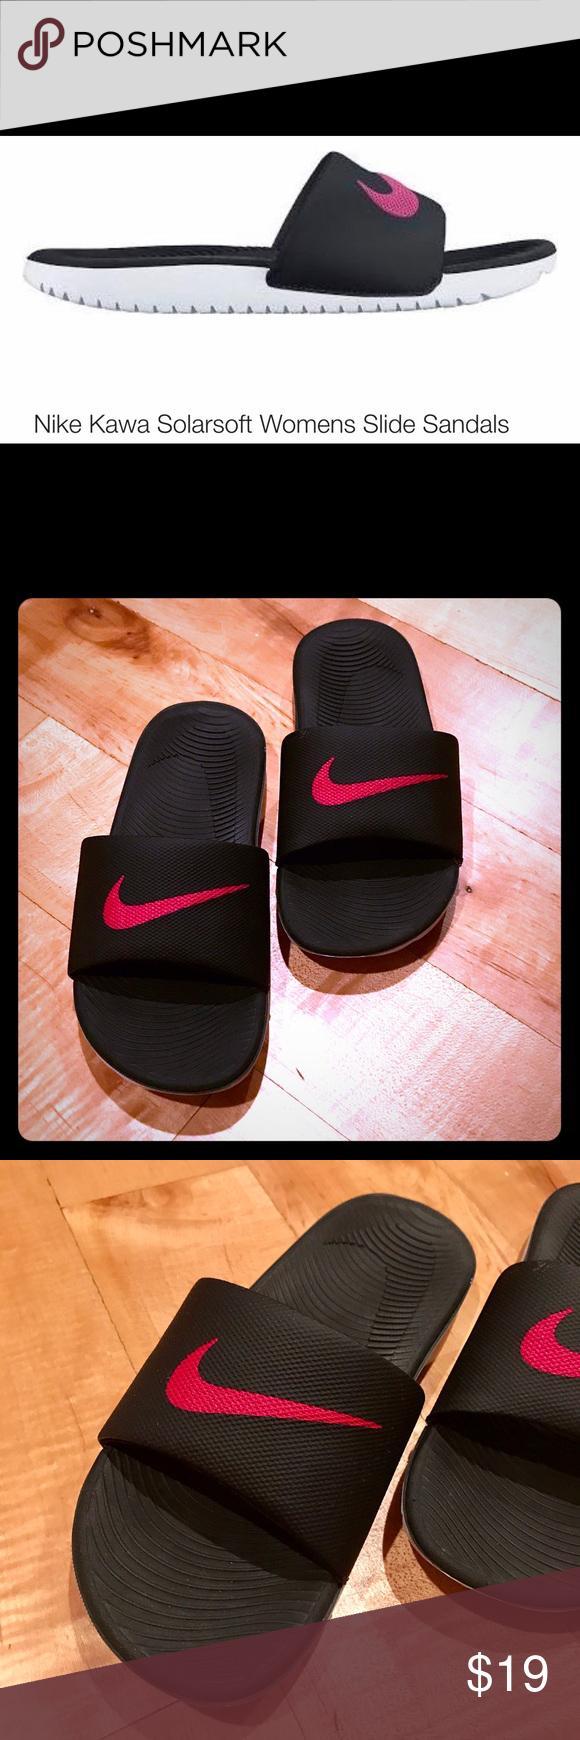 d70b40dab24b ✨🆕✨Nike Kawa Solarsoft Womens Slide Sandals ✨🆕✨Nike Black sandals with  pink Nike logo and White bottoms. Worn twice  basically brand new.